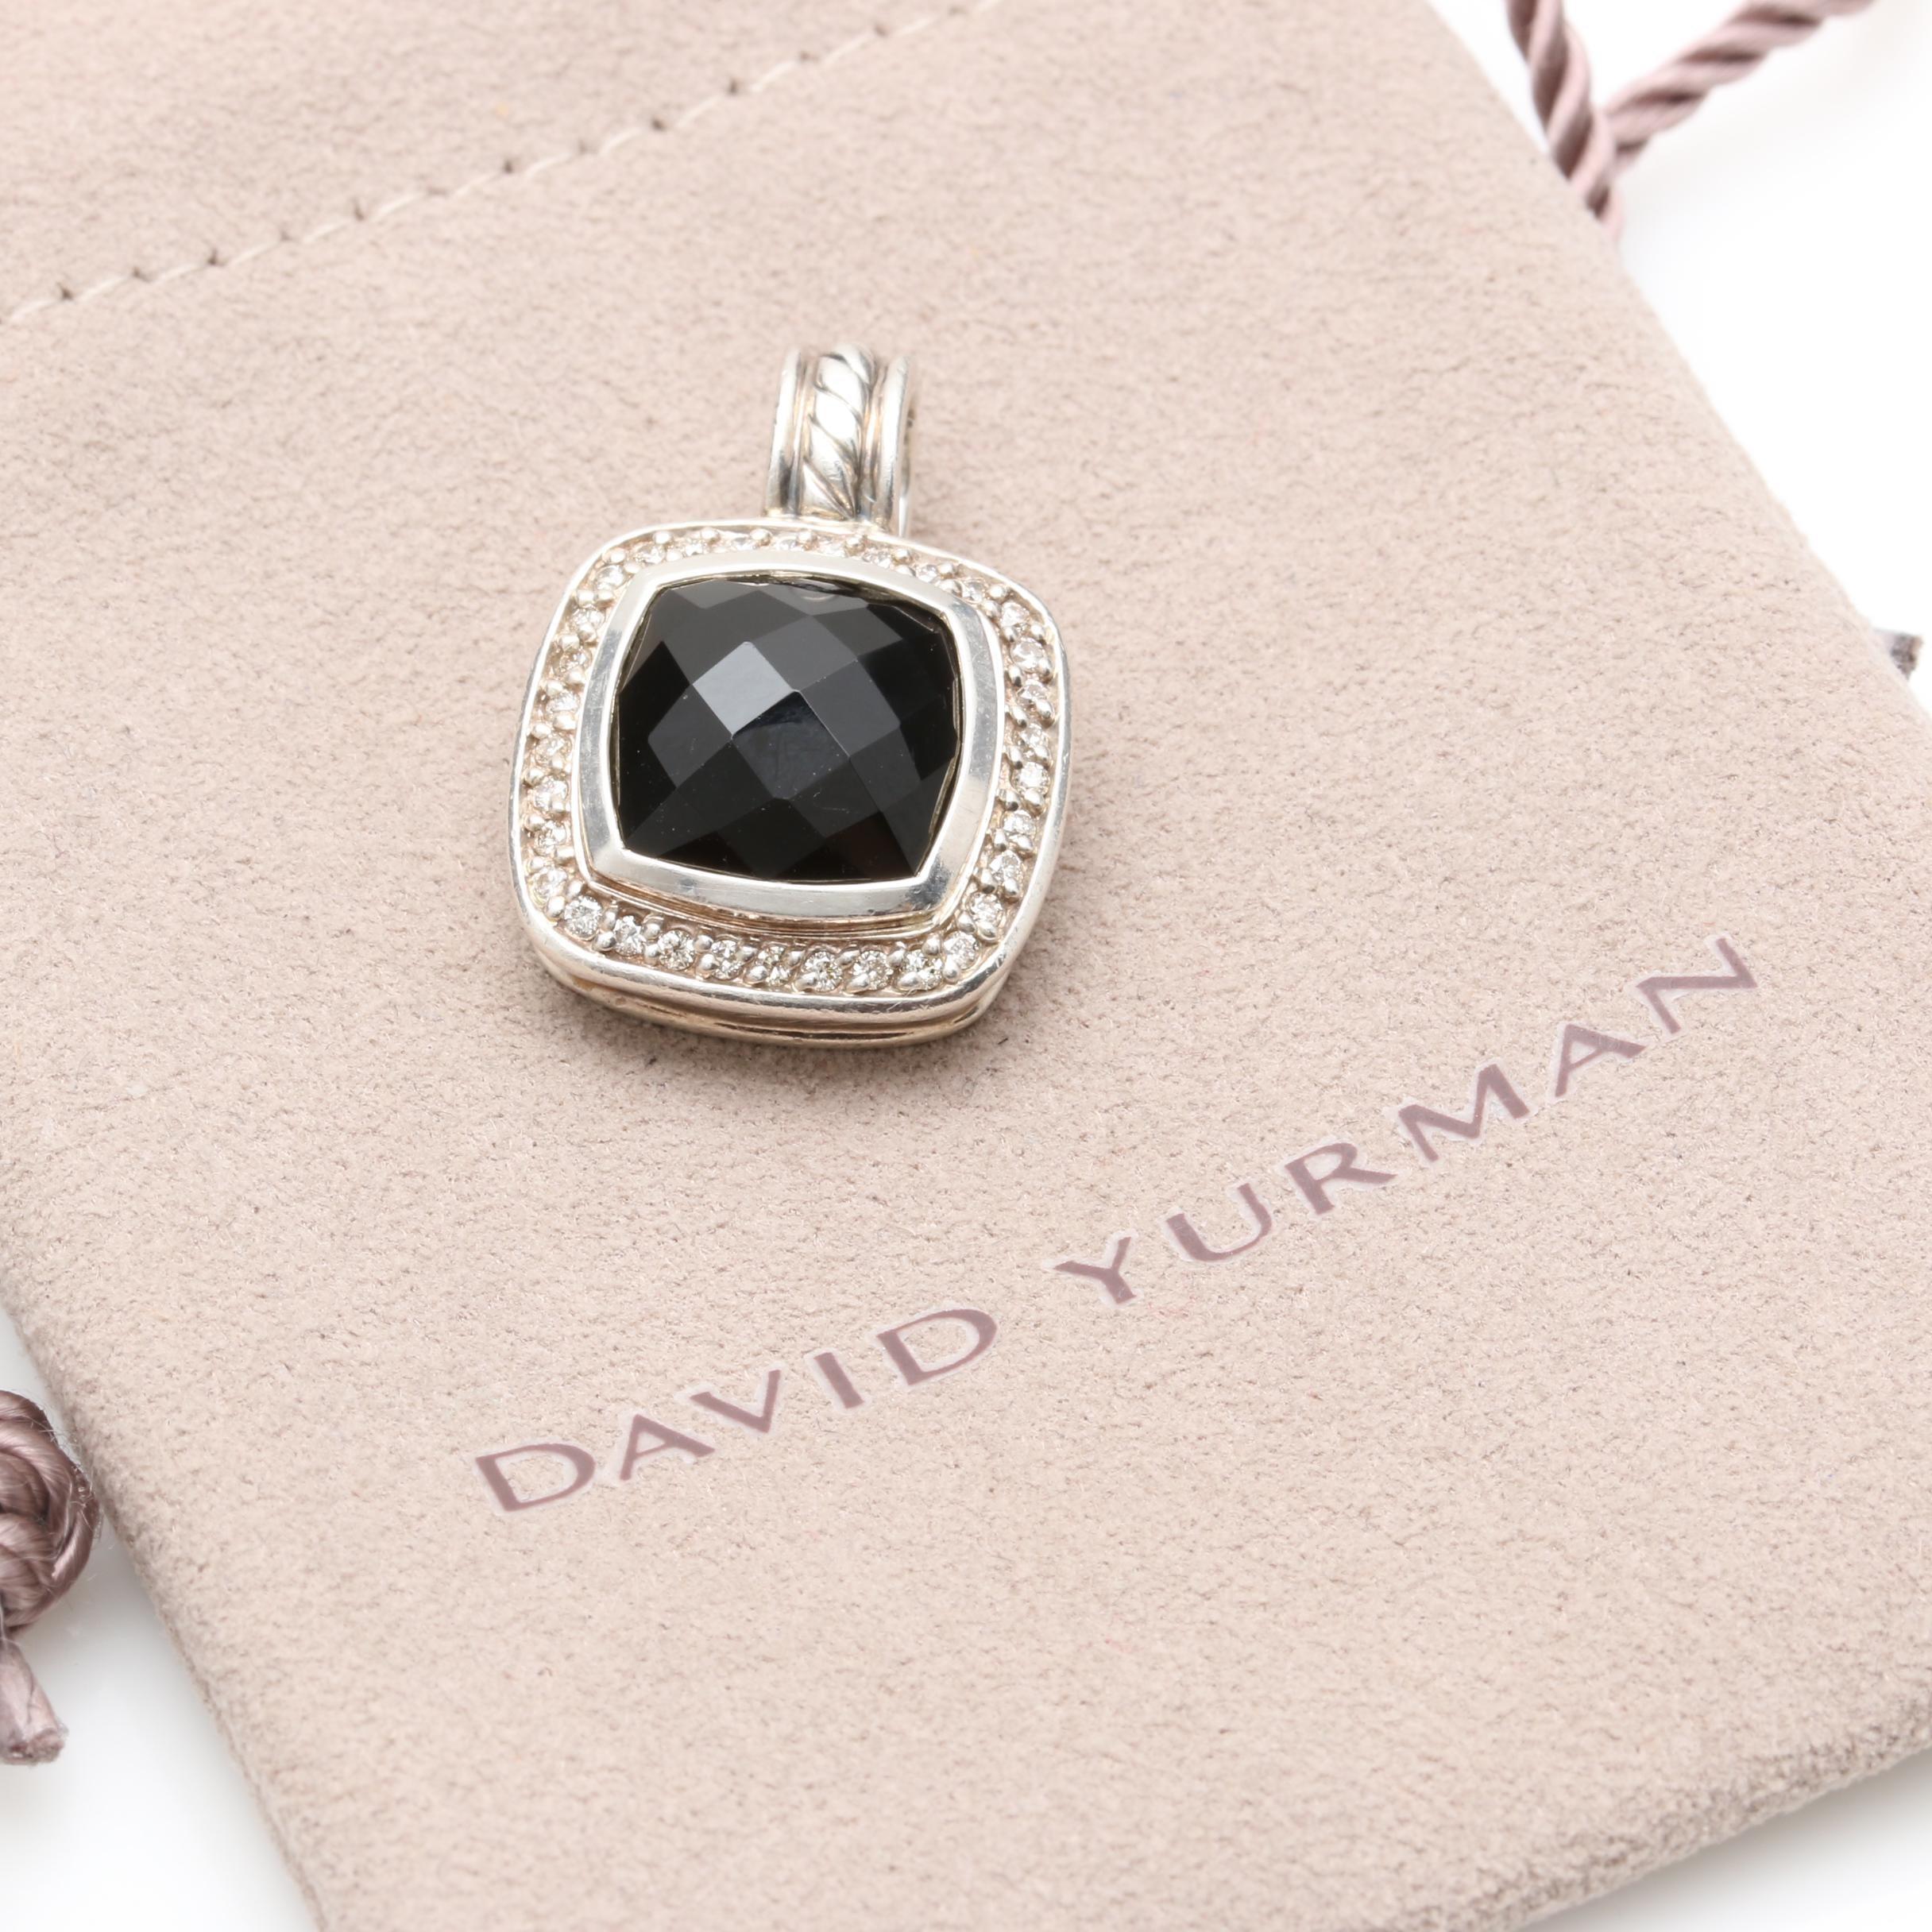 David Yurman Albion Sterling Silver Black Onyx and Diamond Pendant